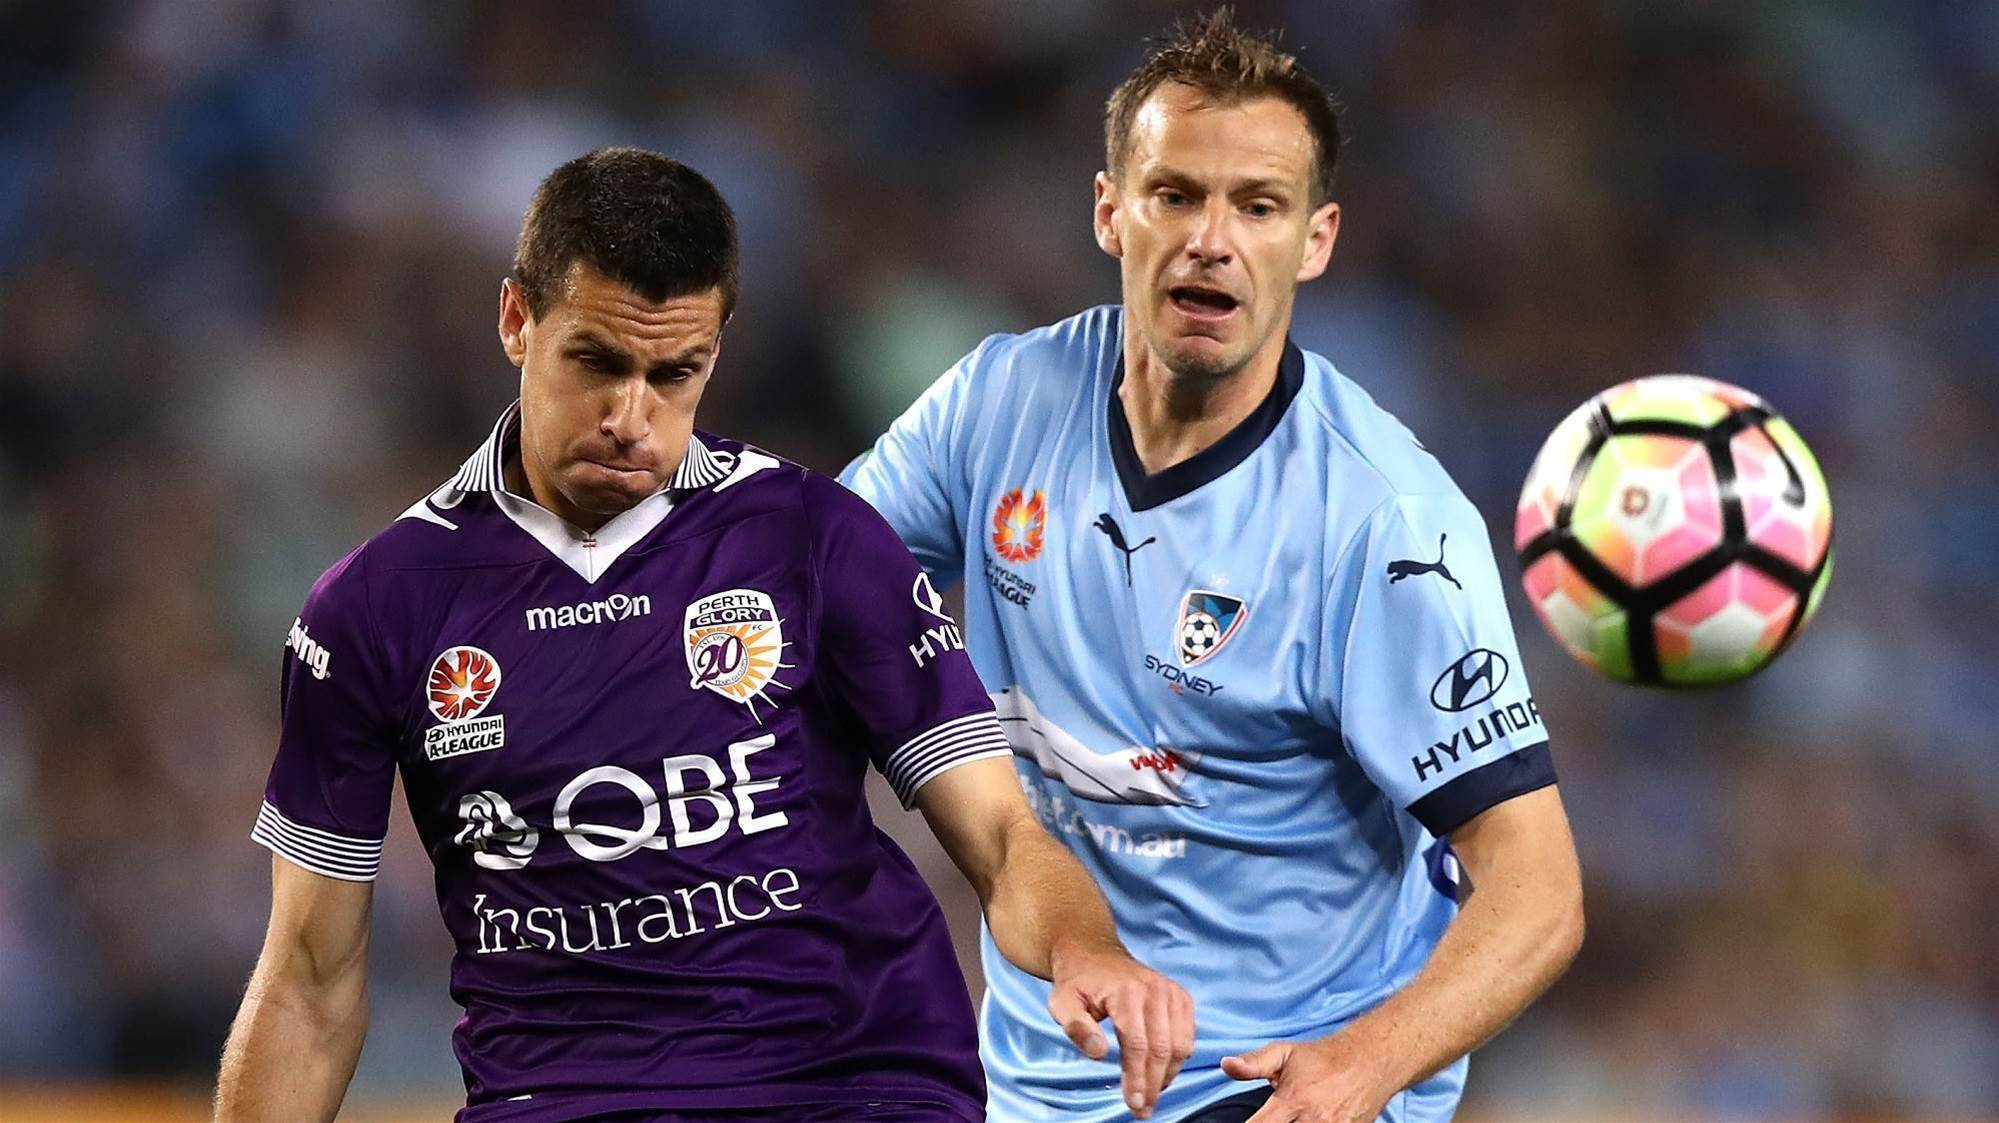 Wilkinson hails Sydney's depth